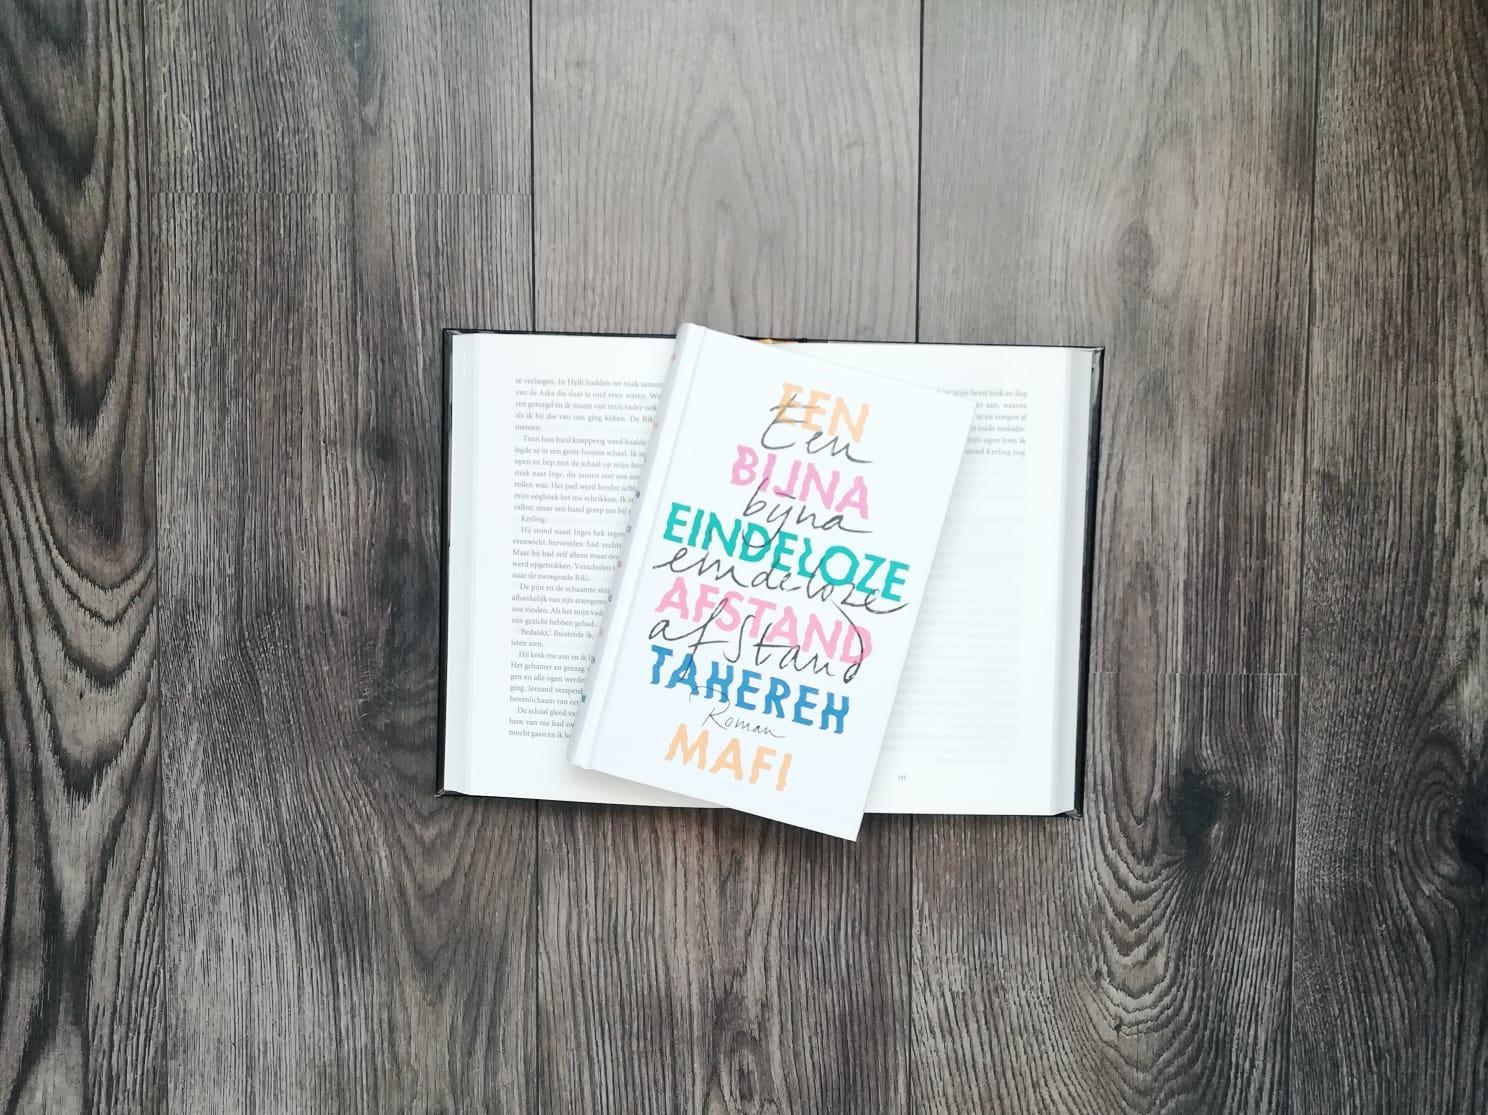 Een bijna eindeloze afstand - Tahereh Mafi | Marieke's Books